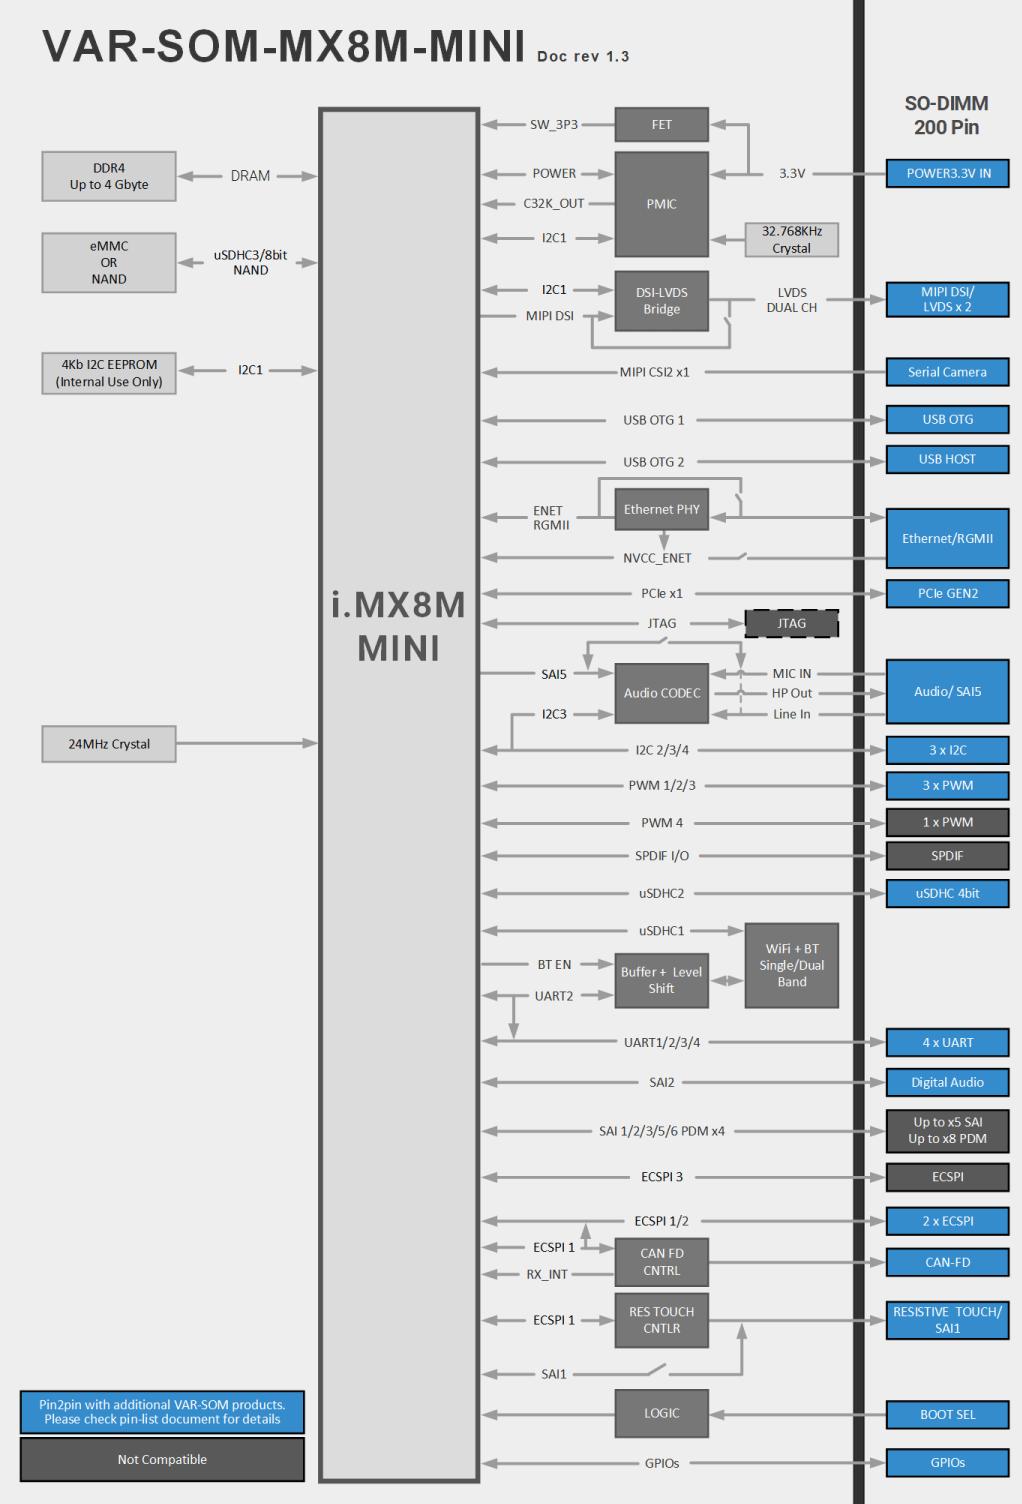 VAR-SOM-MX8M-MINI Block Diagram NXP i.MX8M Mini Diagram